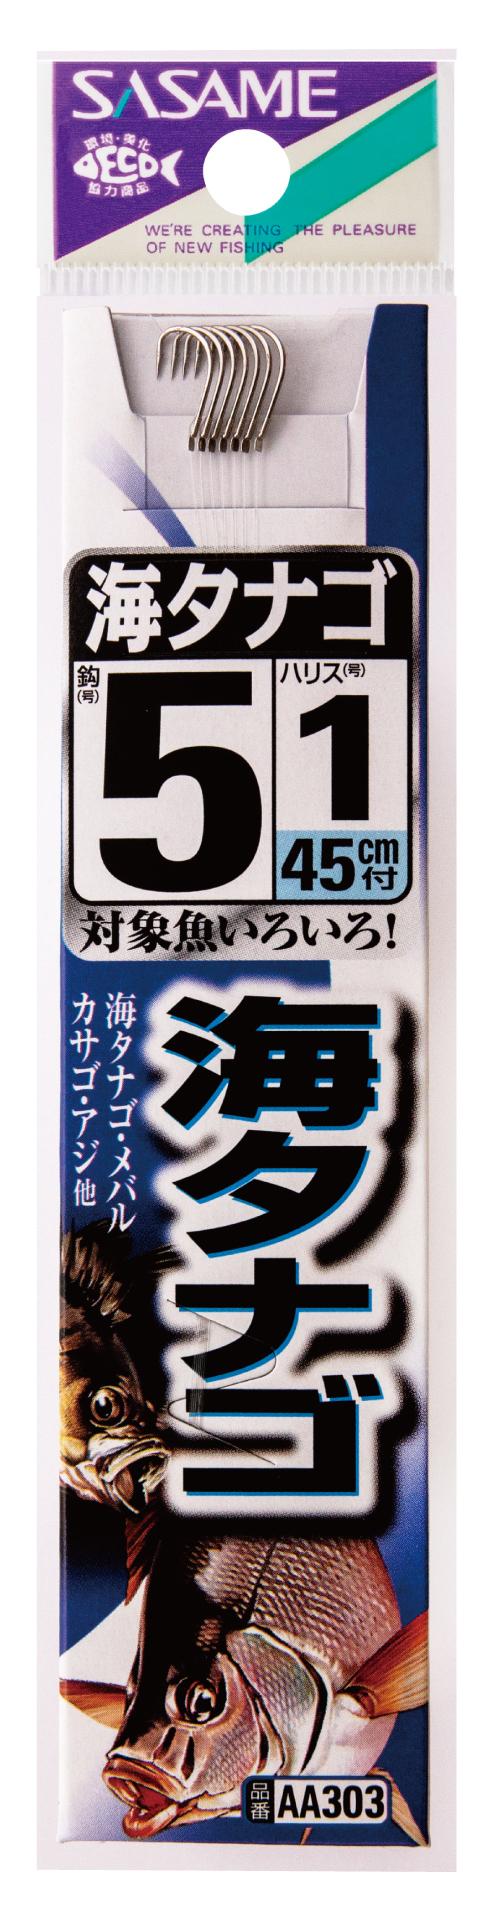 AA303